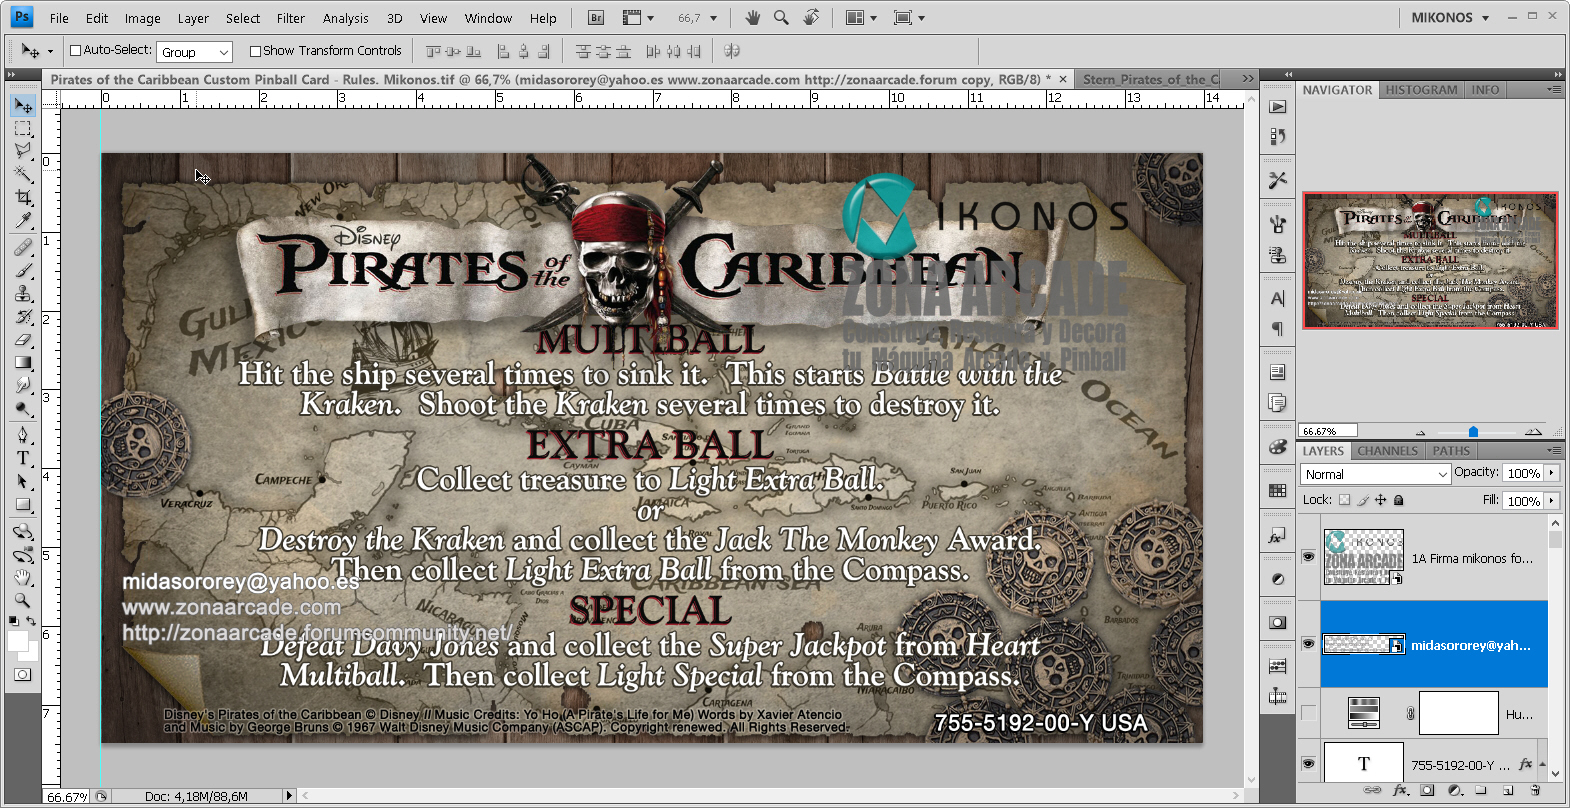 Pirates%20of%20the%20Caribbean%20Custom%20Pinball%20Card%20-%20Rules.%20Mikonos1.jpg